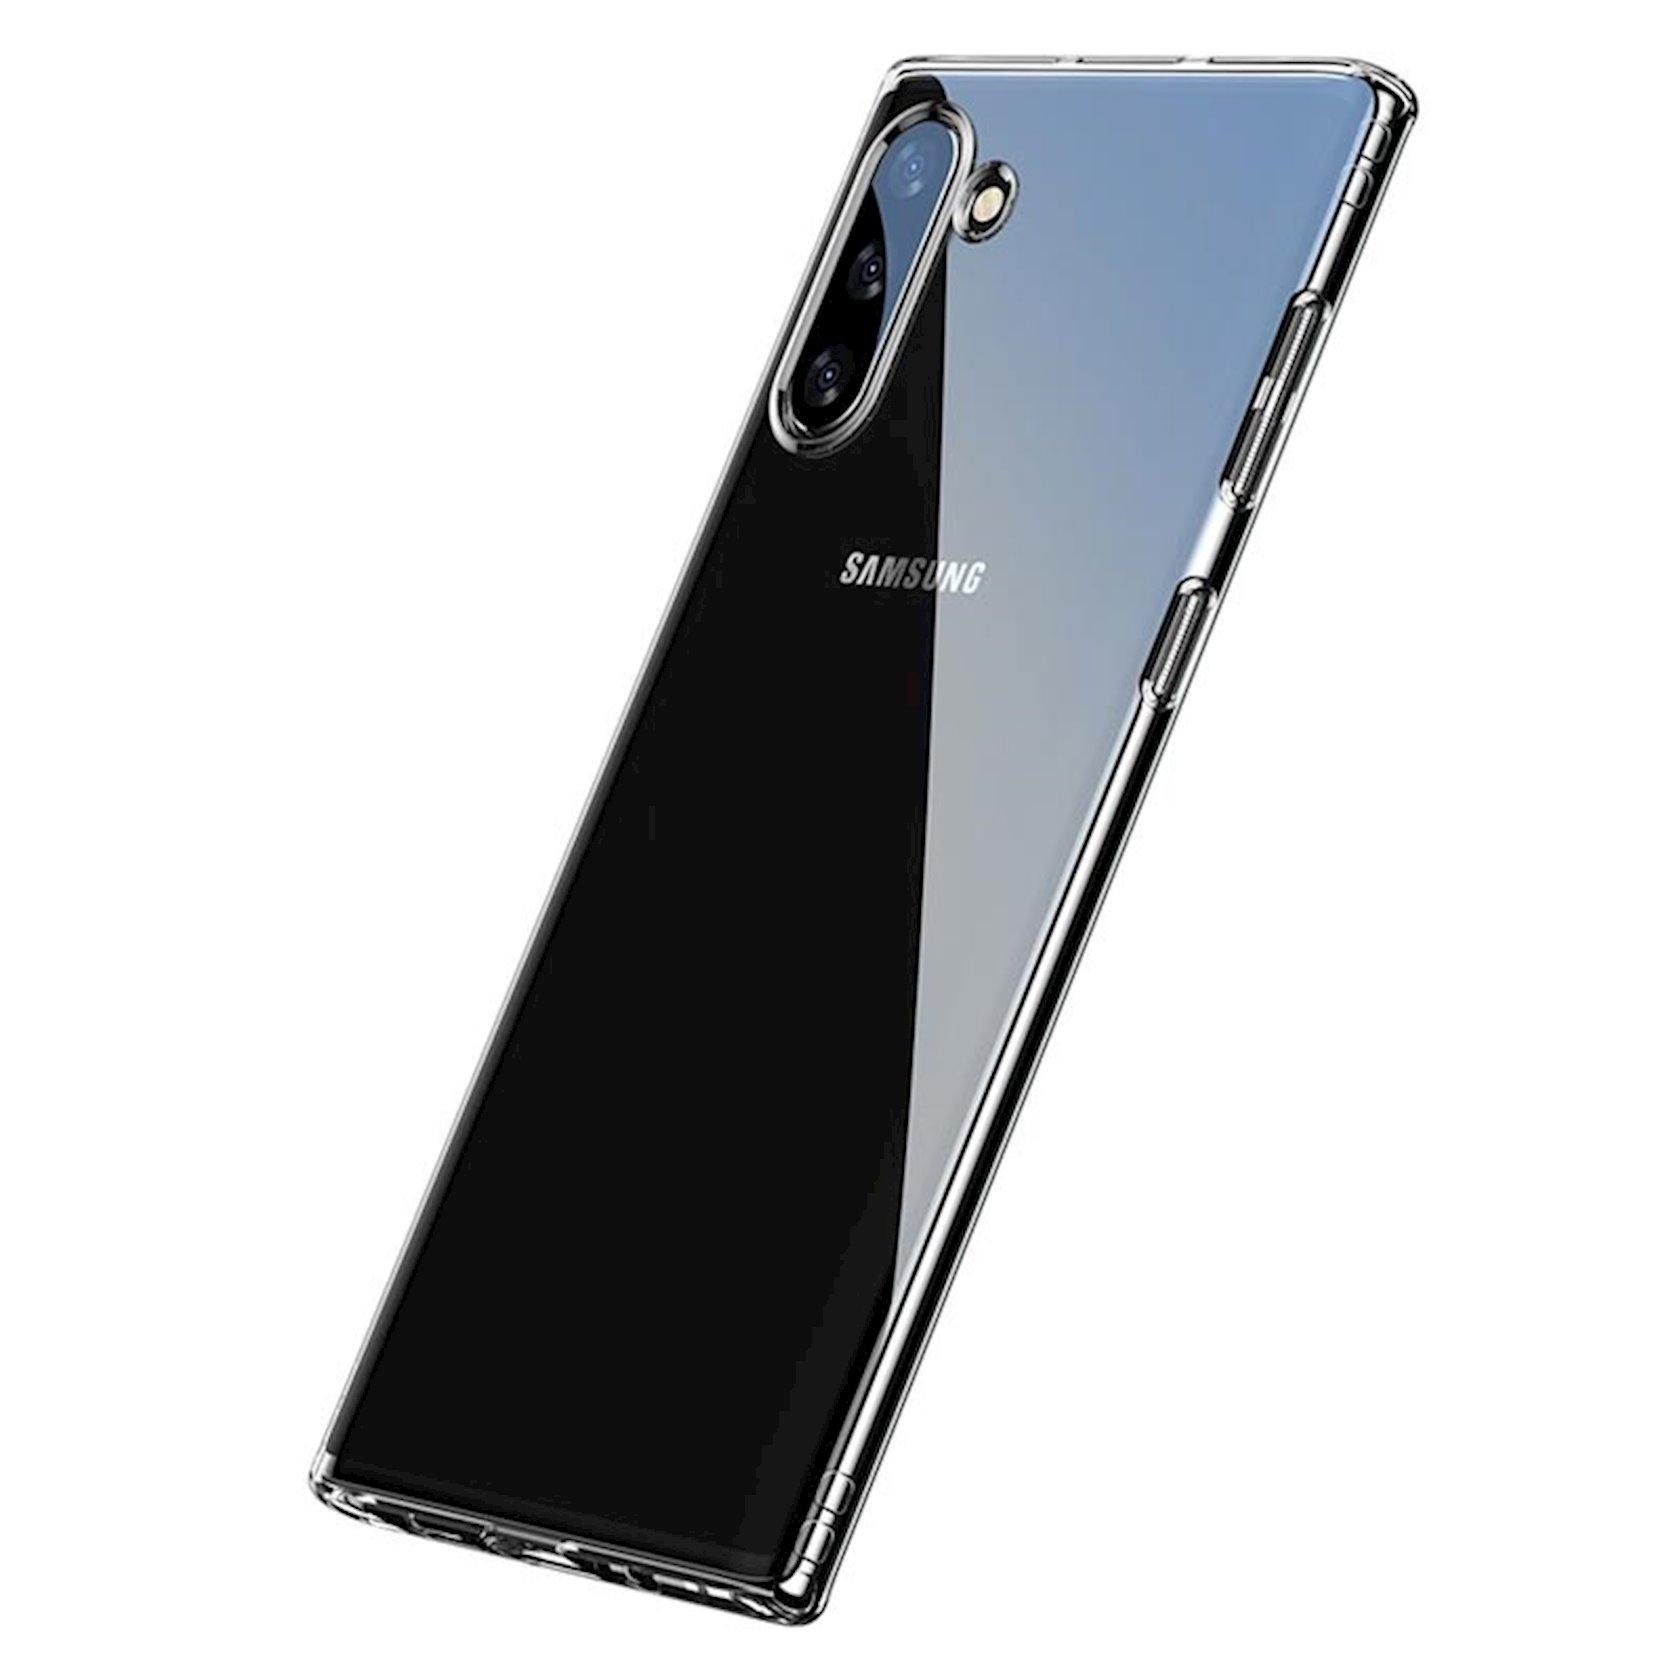 Çexol smartfon üçün Baseus Simple Series Samsung Galaxy Note 10